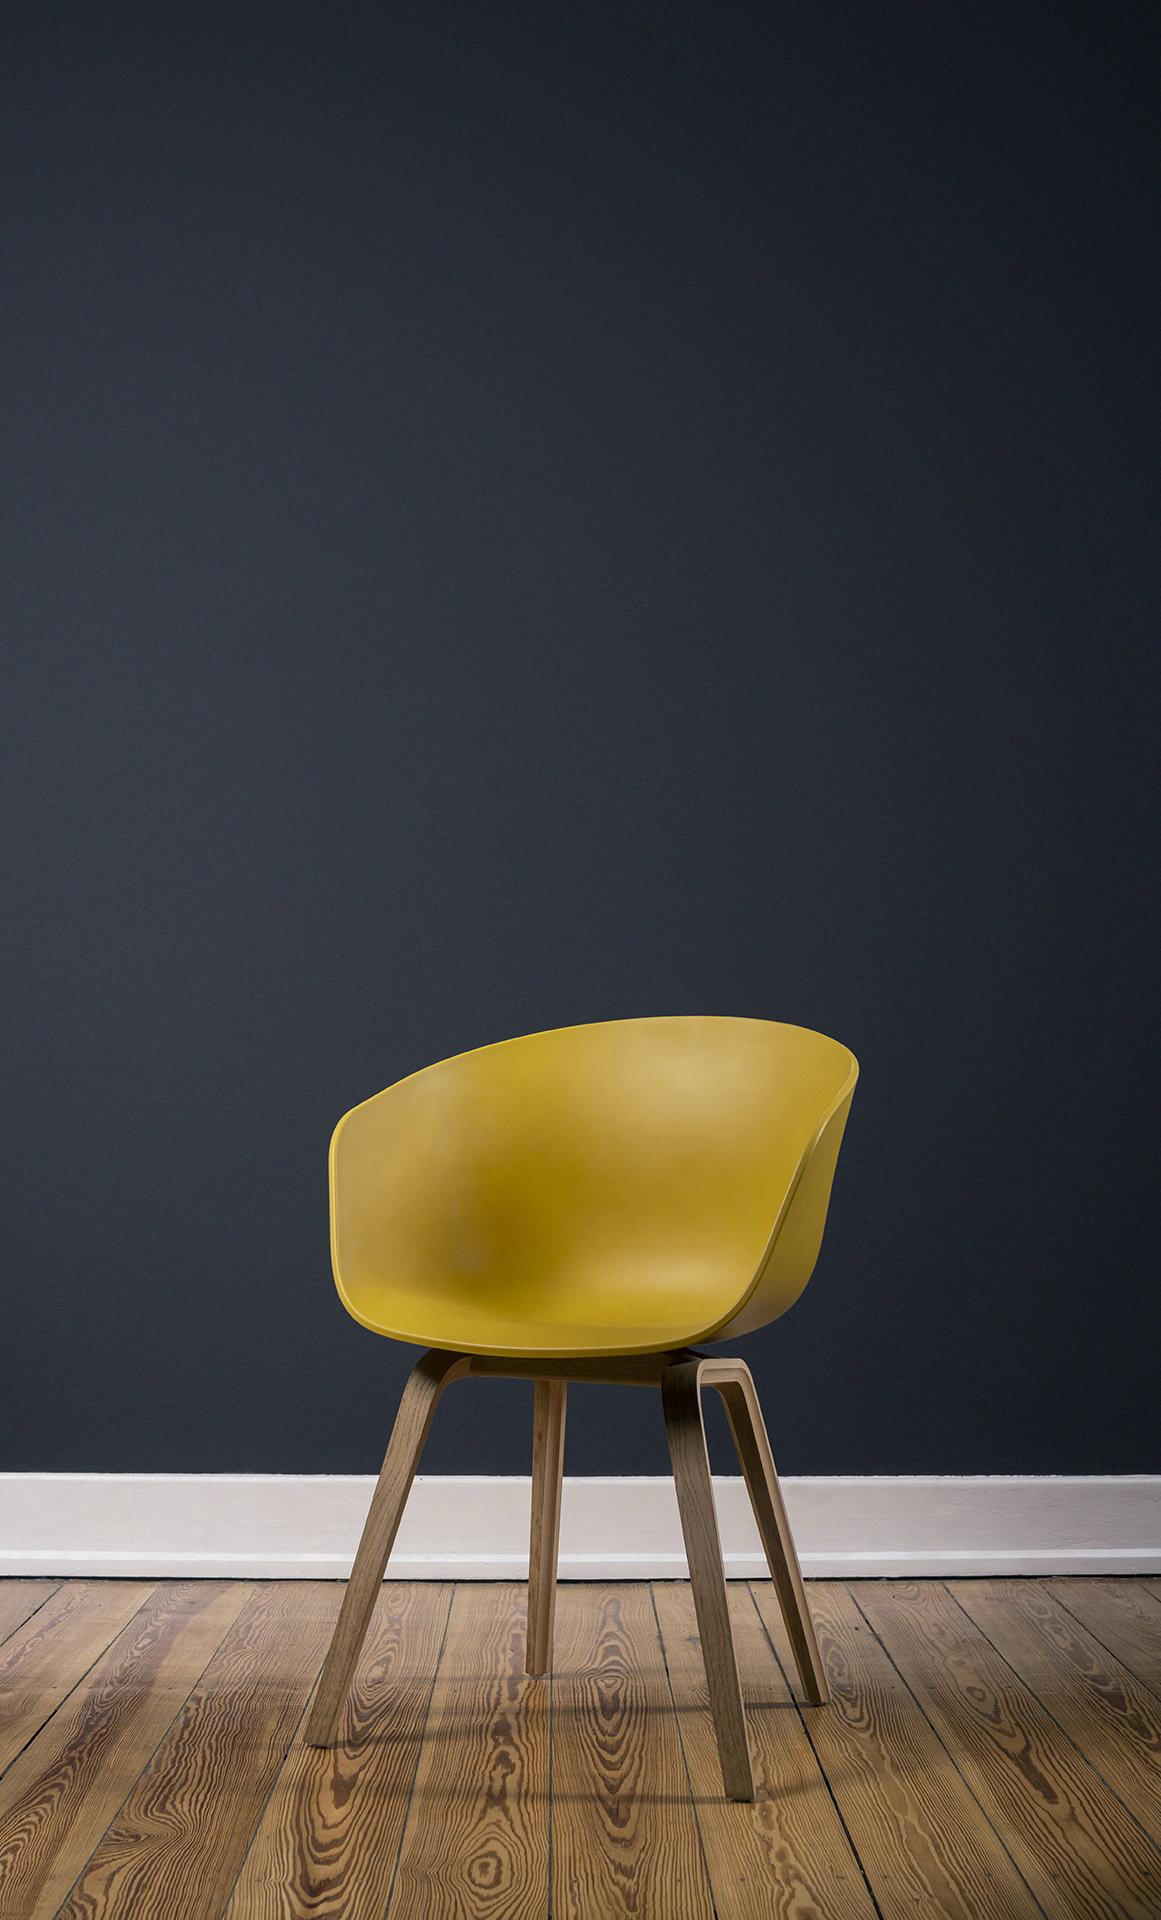 SB_Chair-1